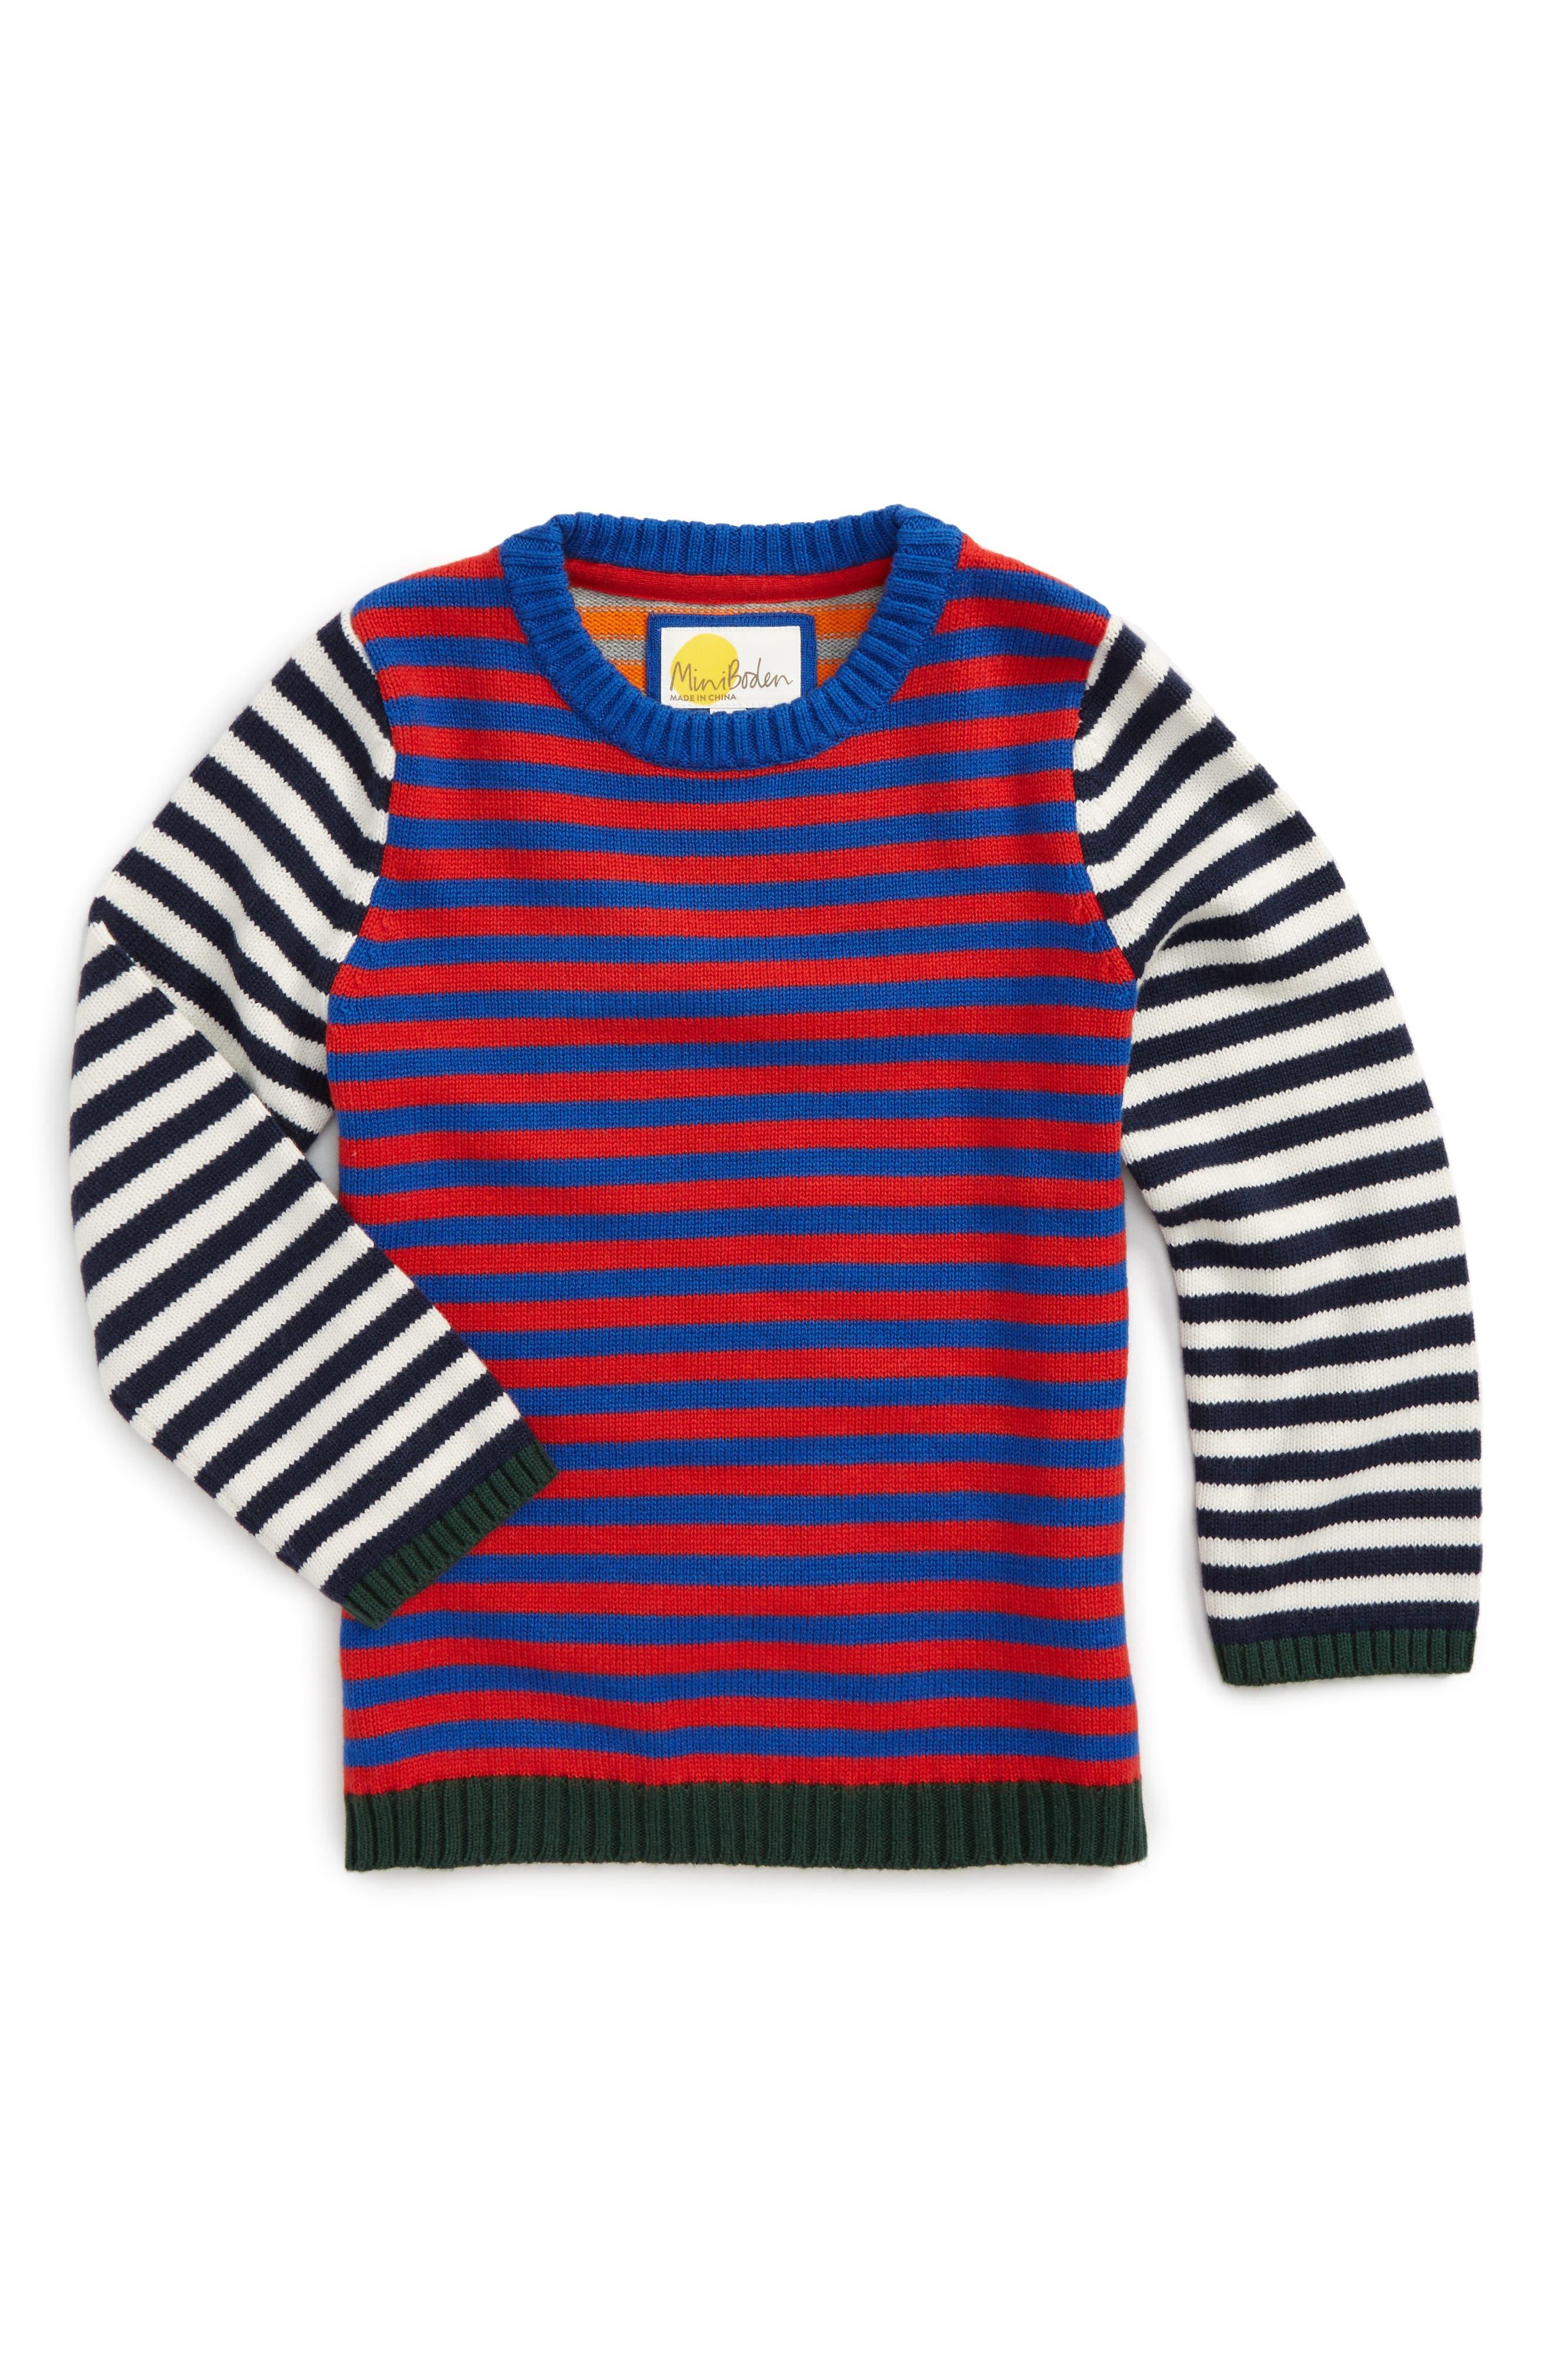 Hotchpotch Sweater,                         Main,                         color, Beatnik Red Hotchpotch